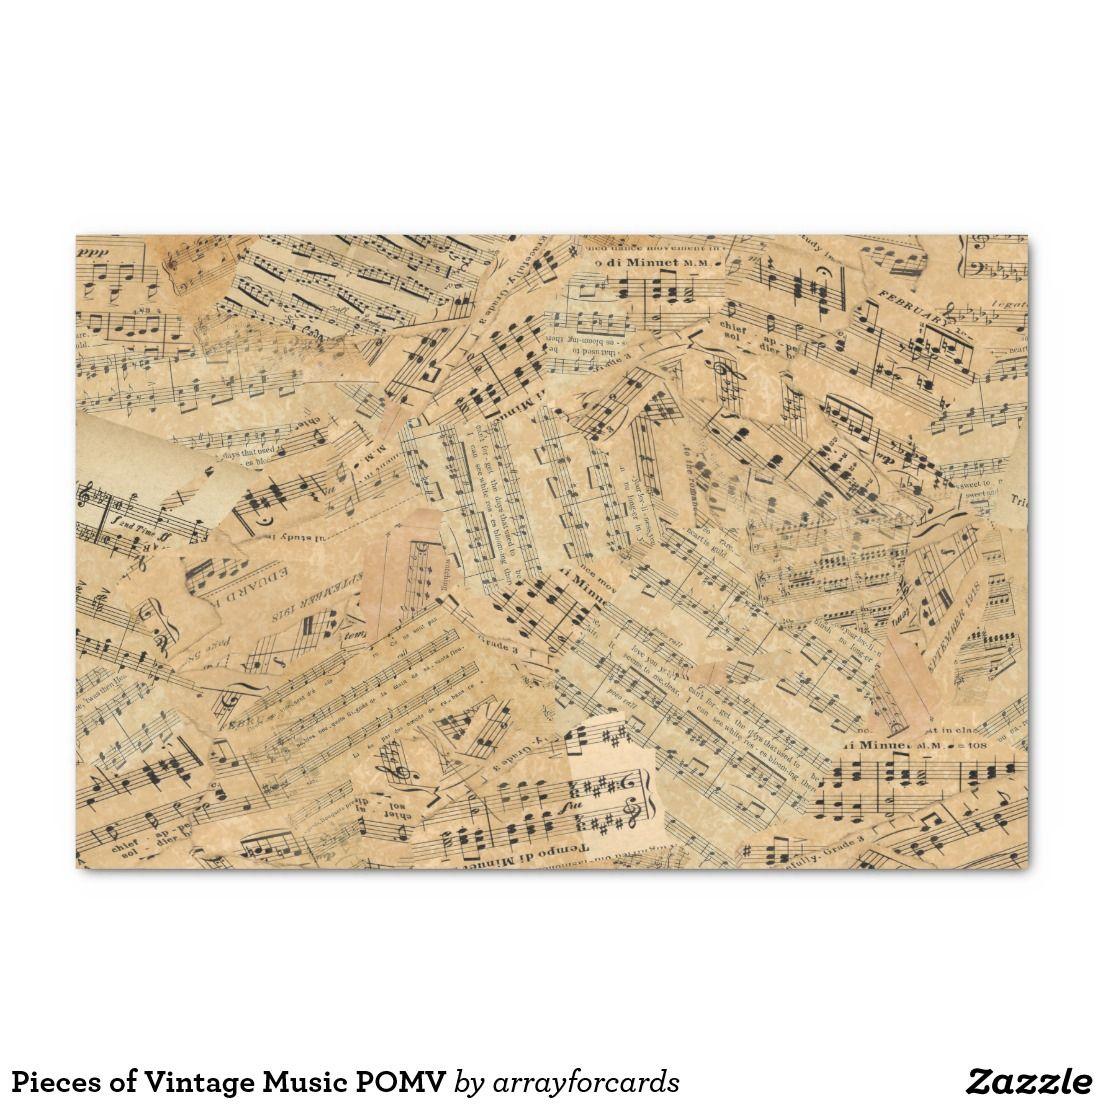 Pieces of Vintage Music POMV